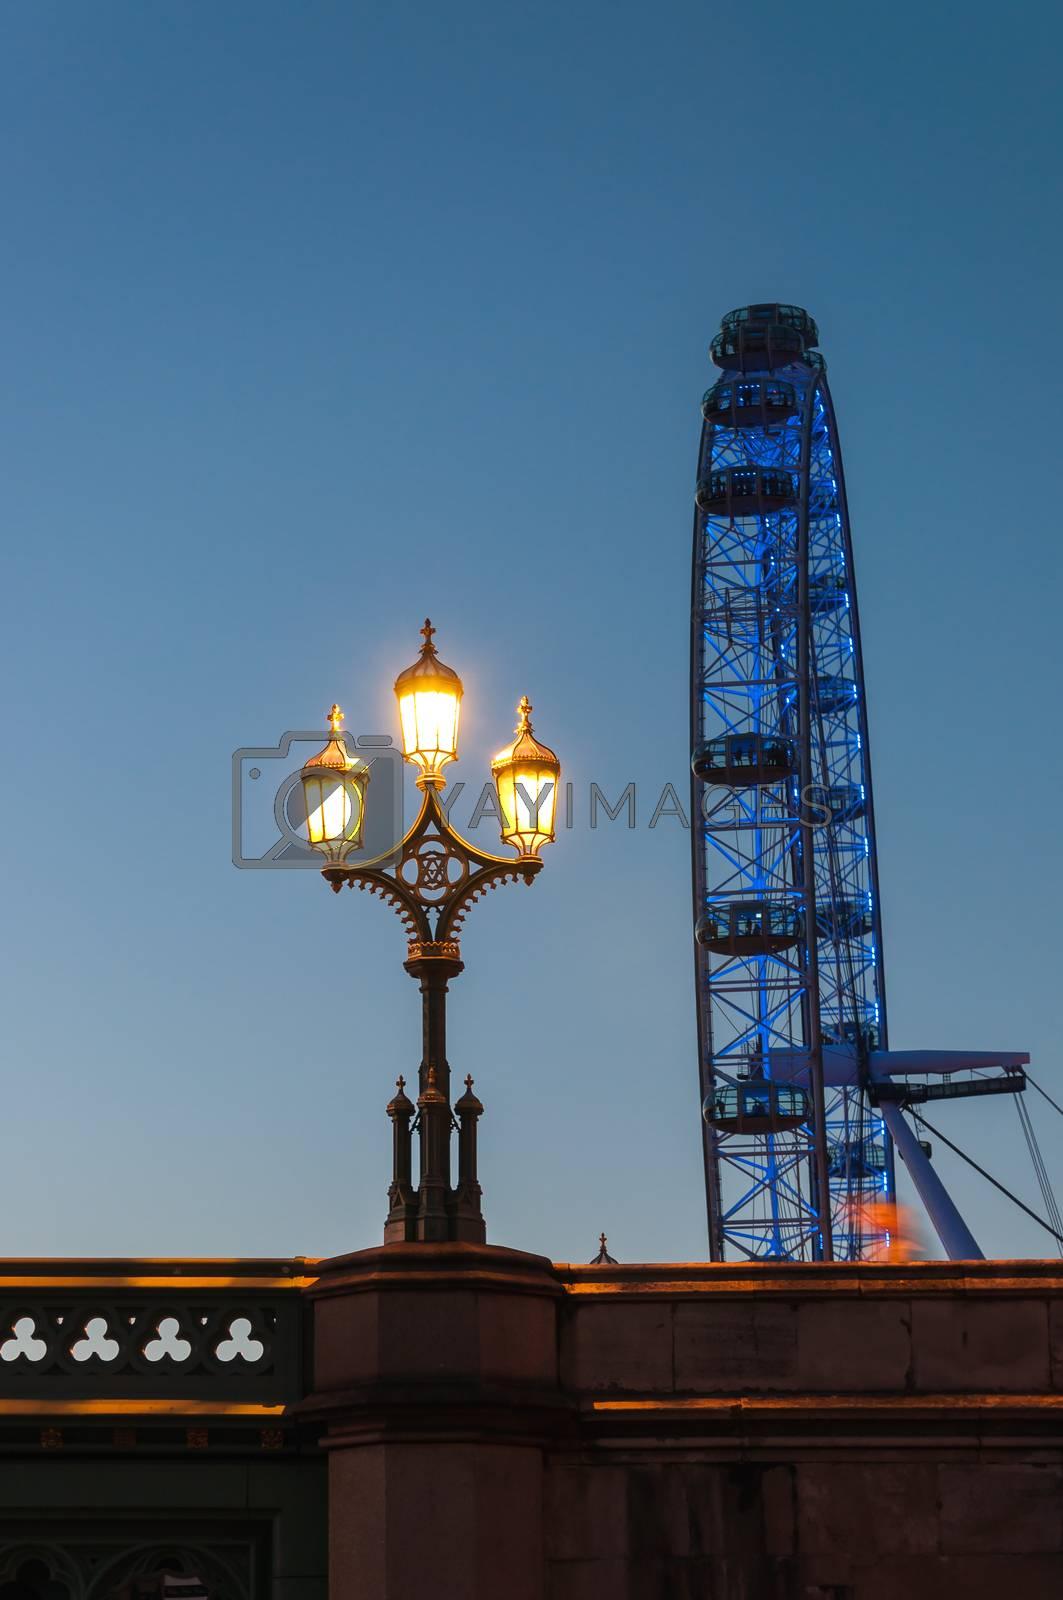 Lantern and London Eye at dusk by mkos83